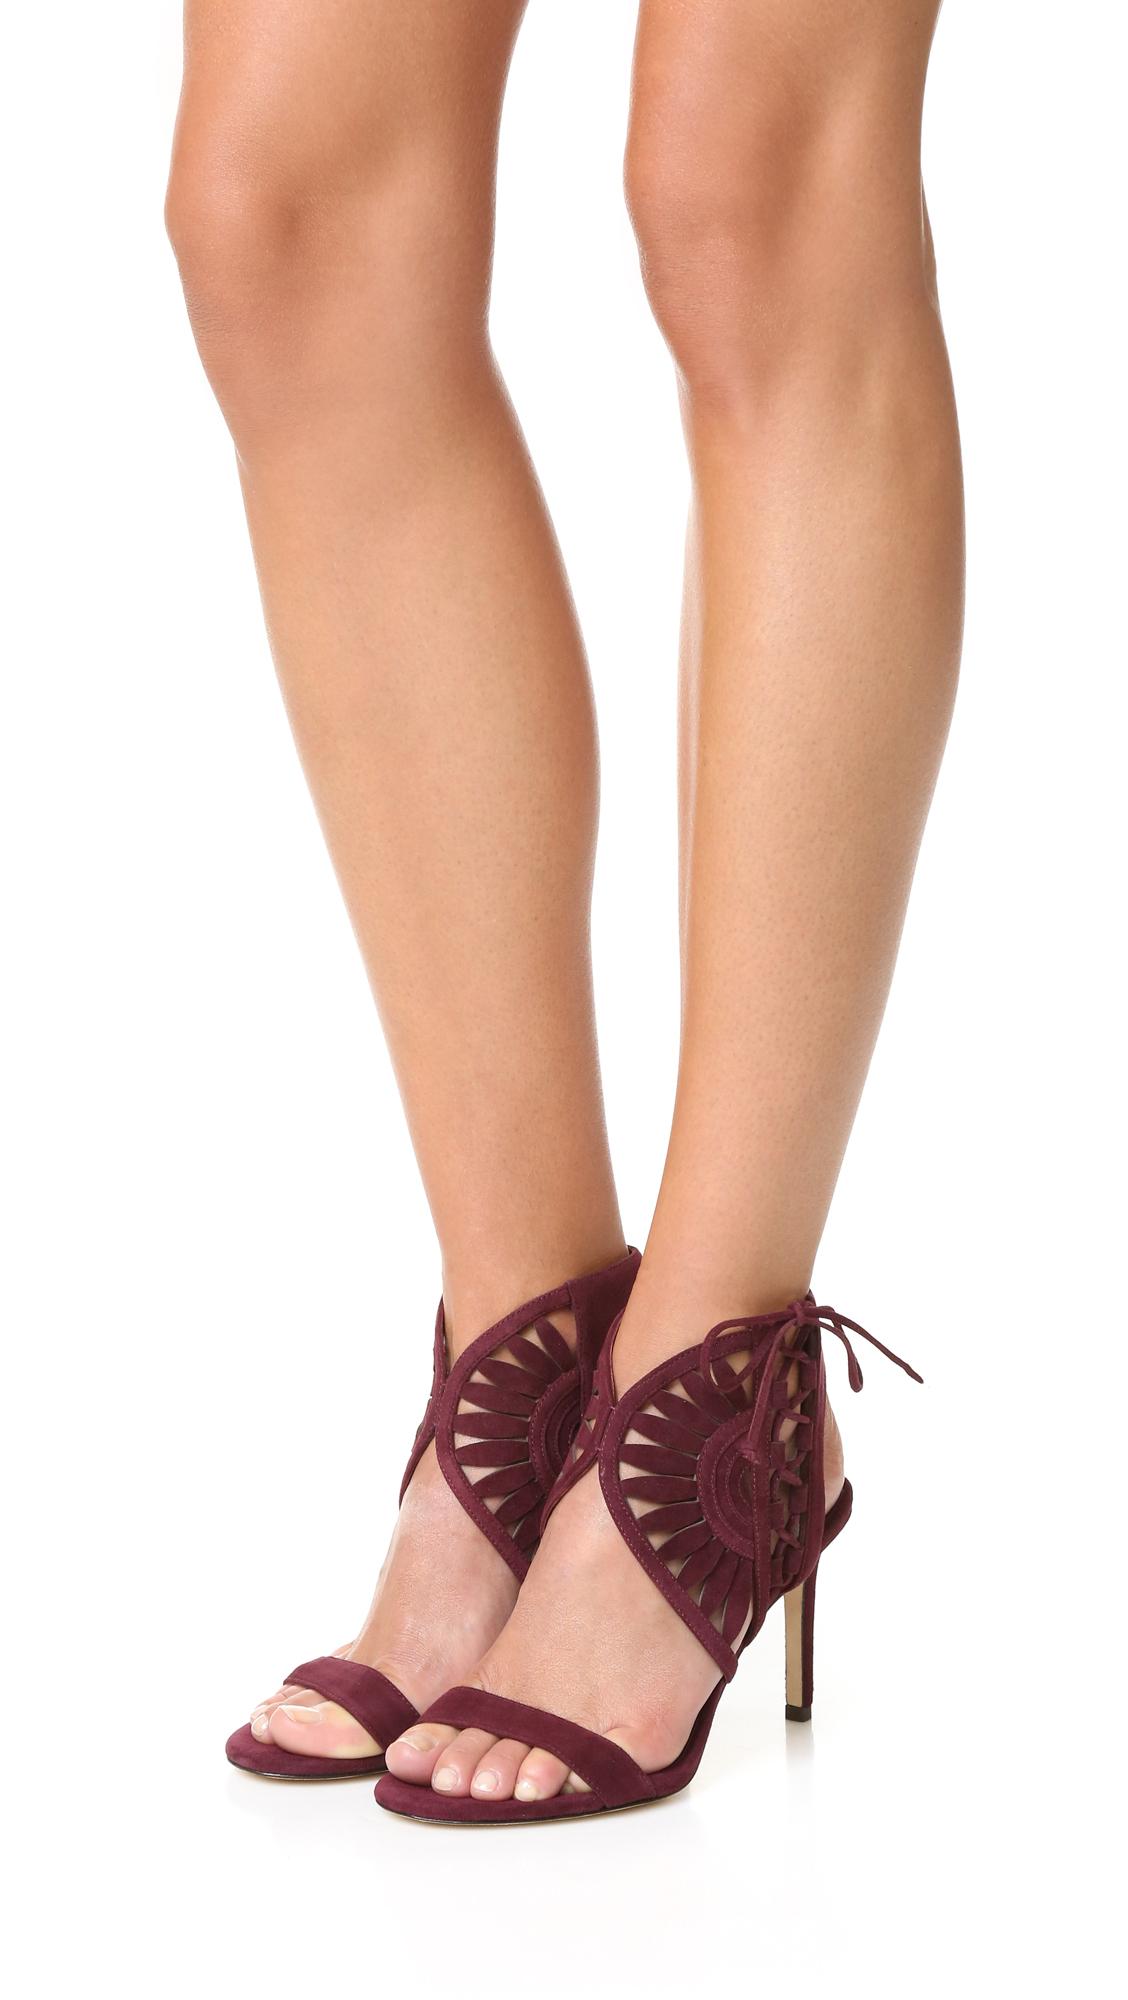 056a811f2 Tory Burch Leyla Sandals